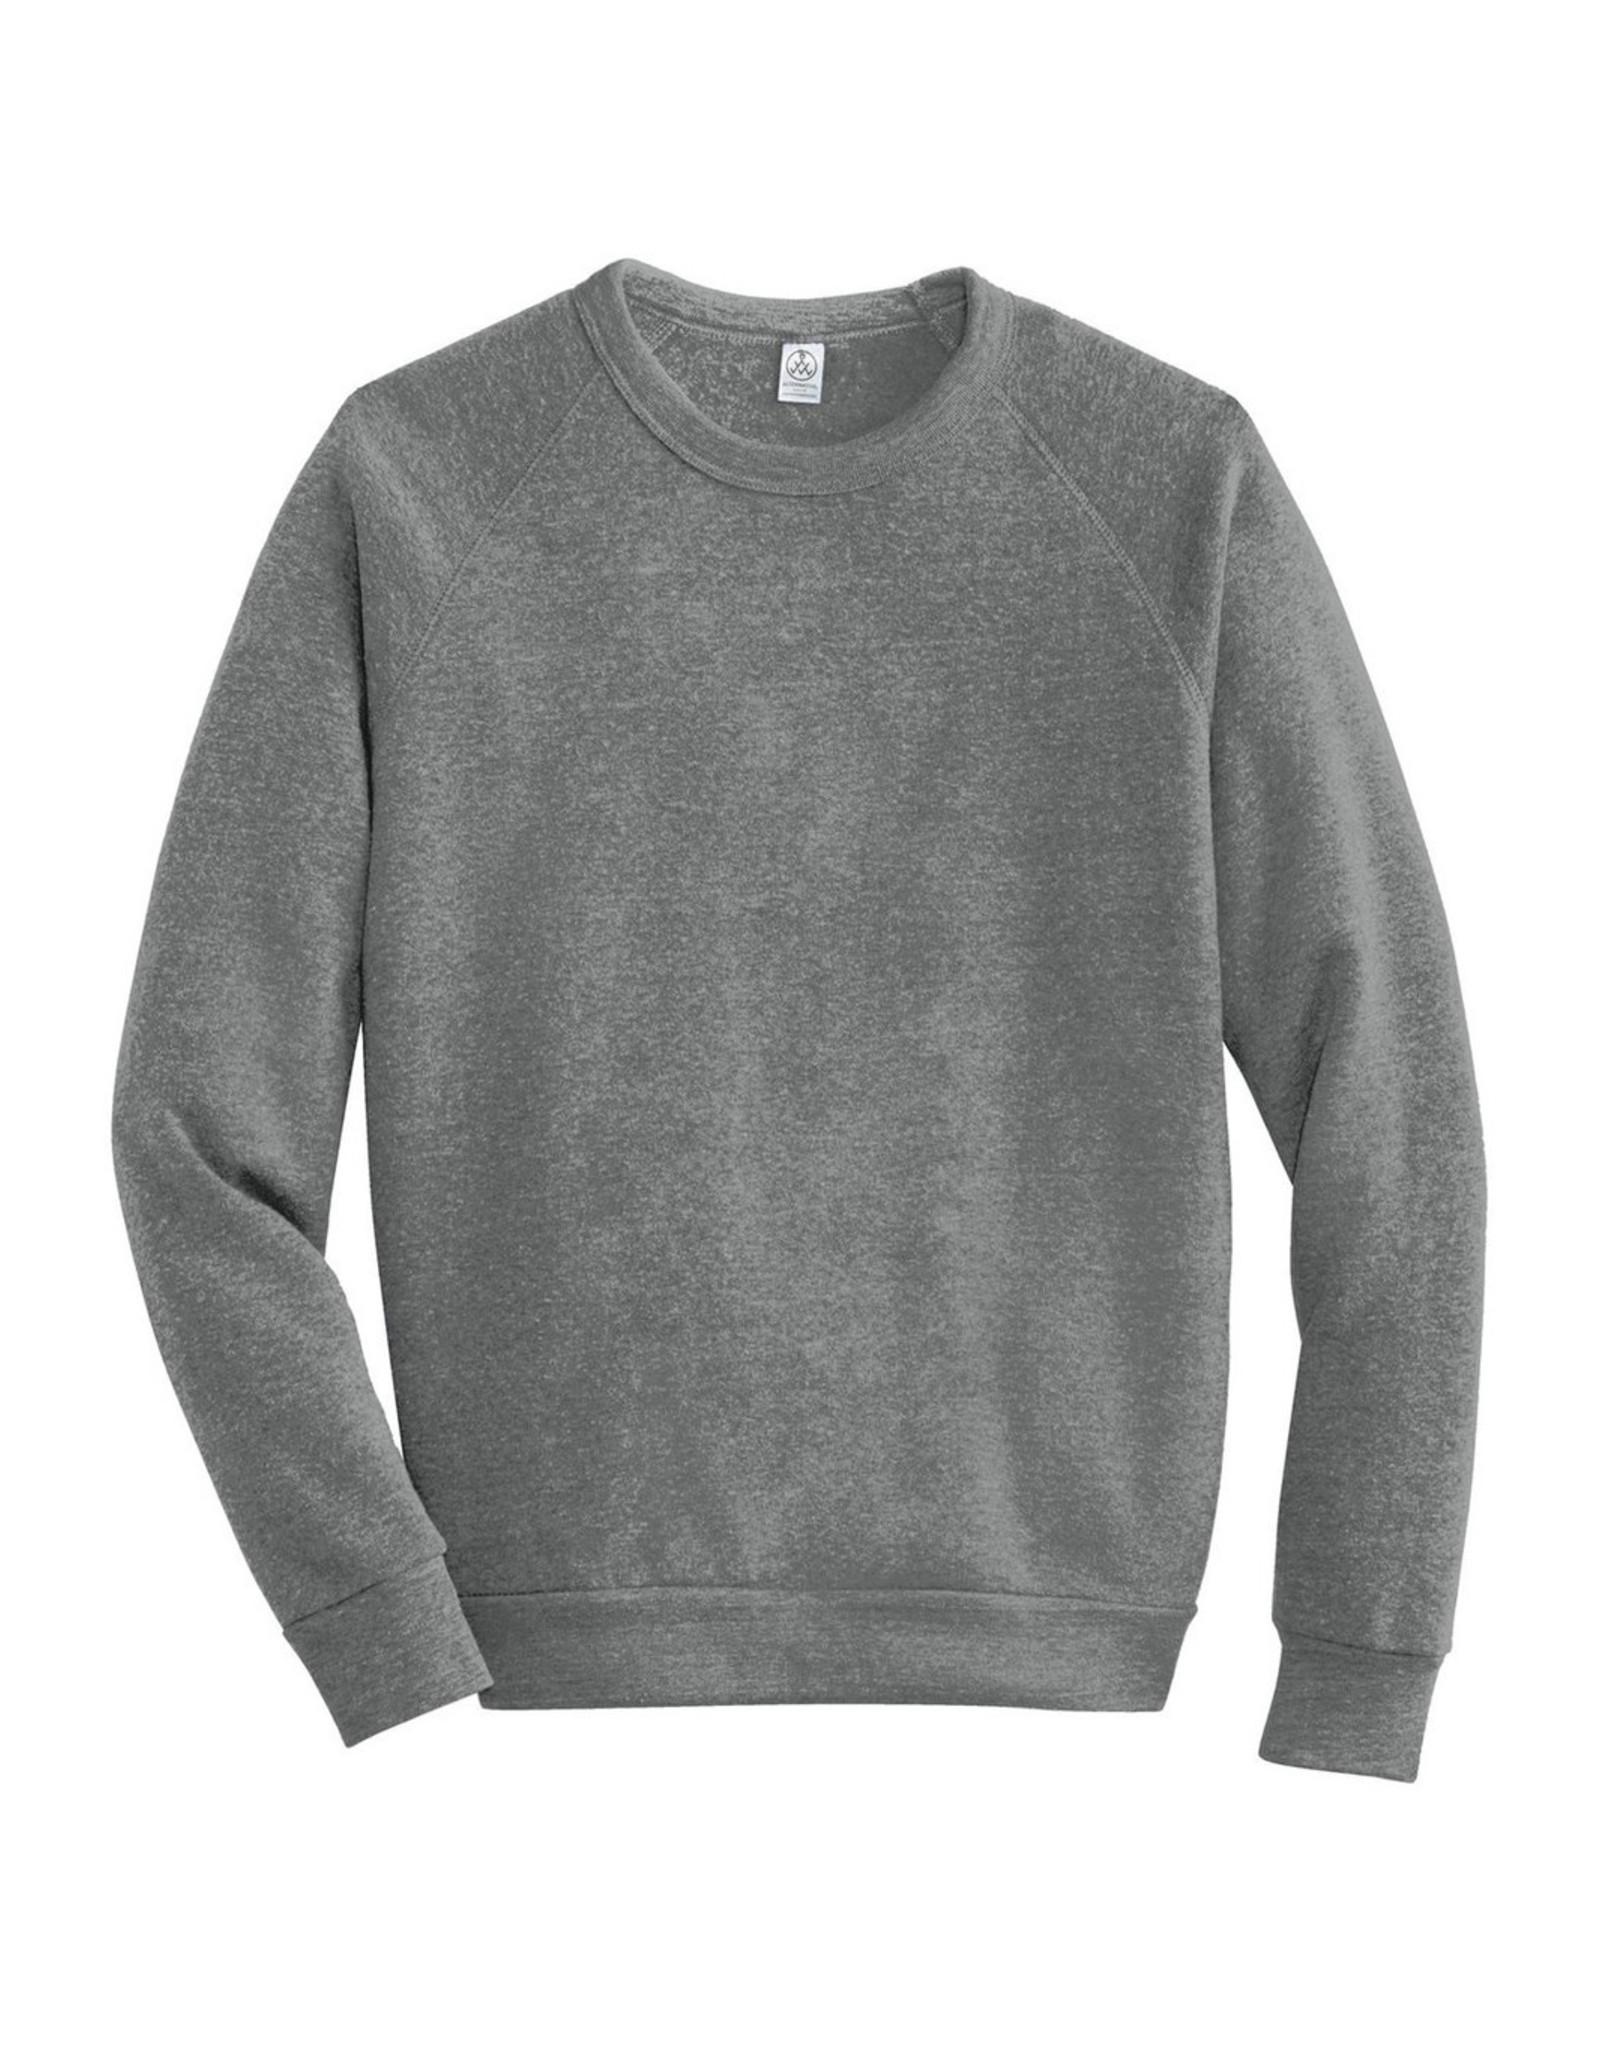 Alternative Apparel Eco-Fleece Champ Sweatshirt - Eco Grey